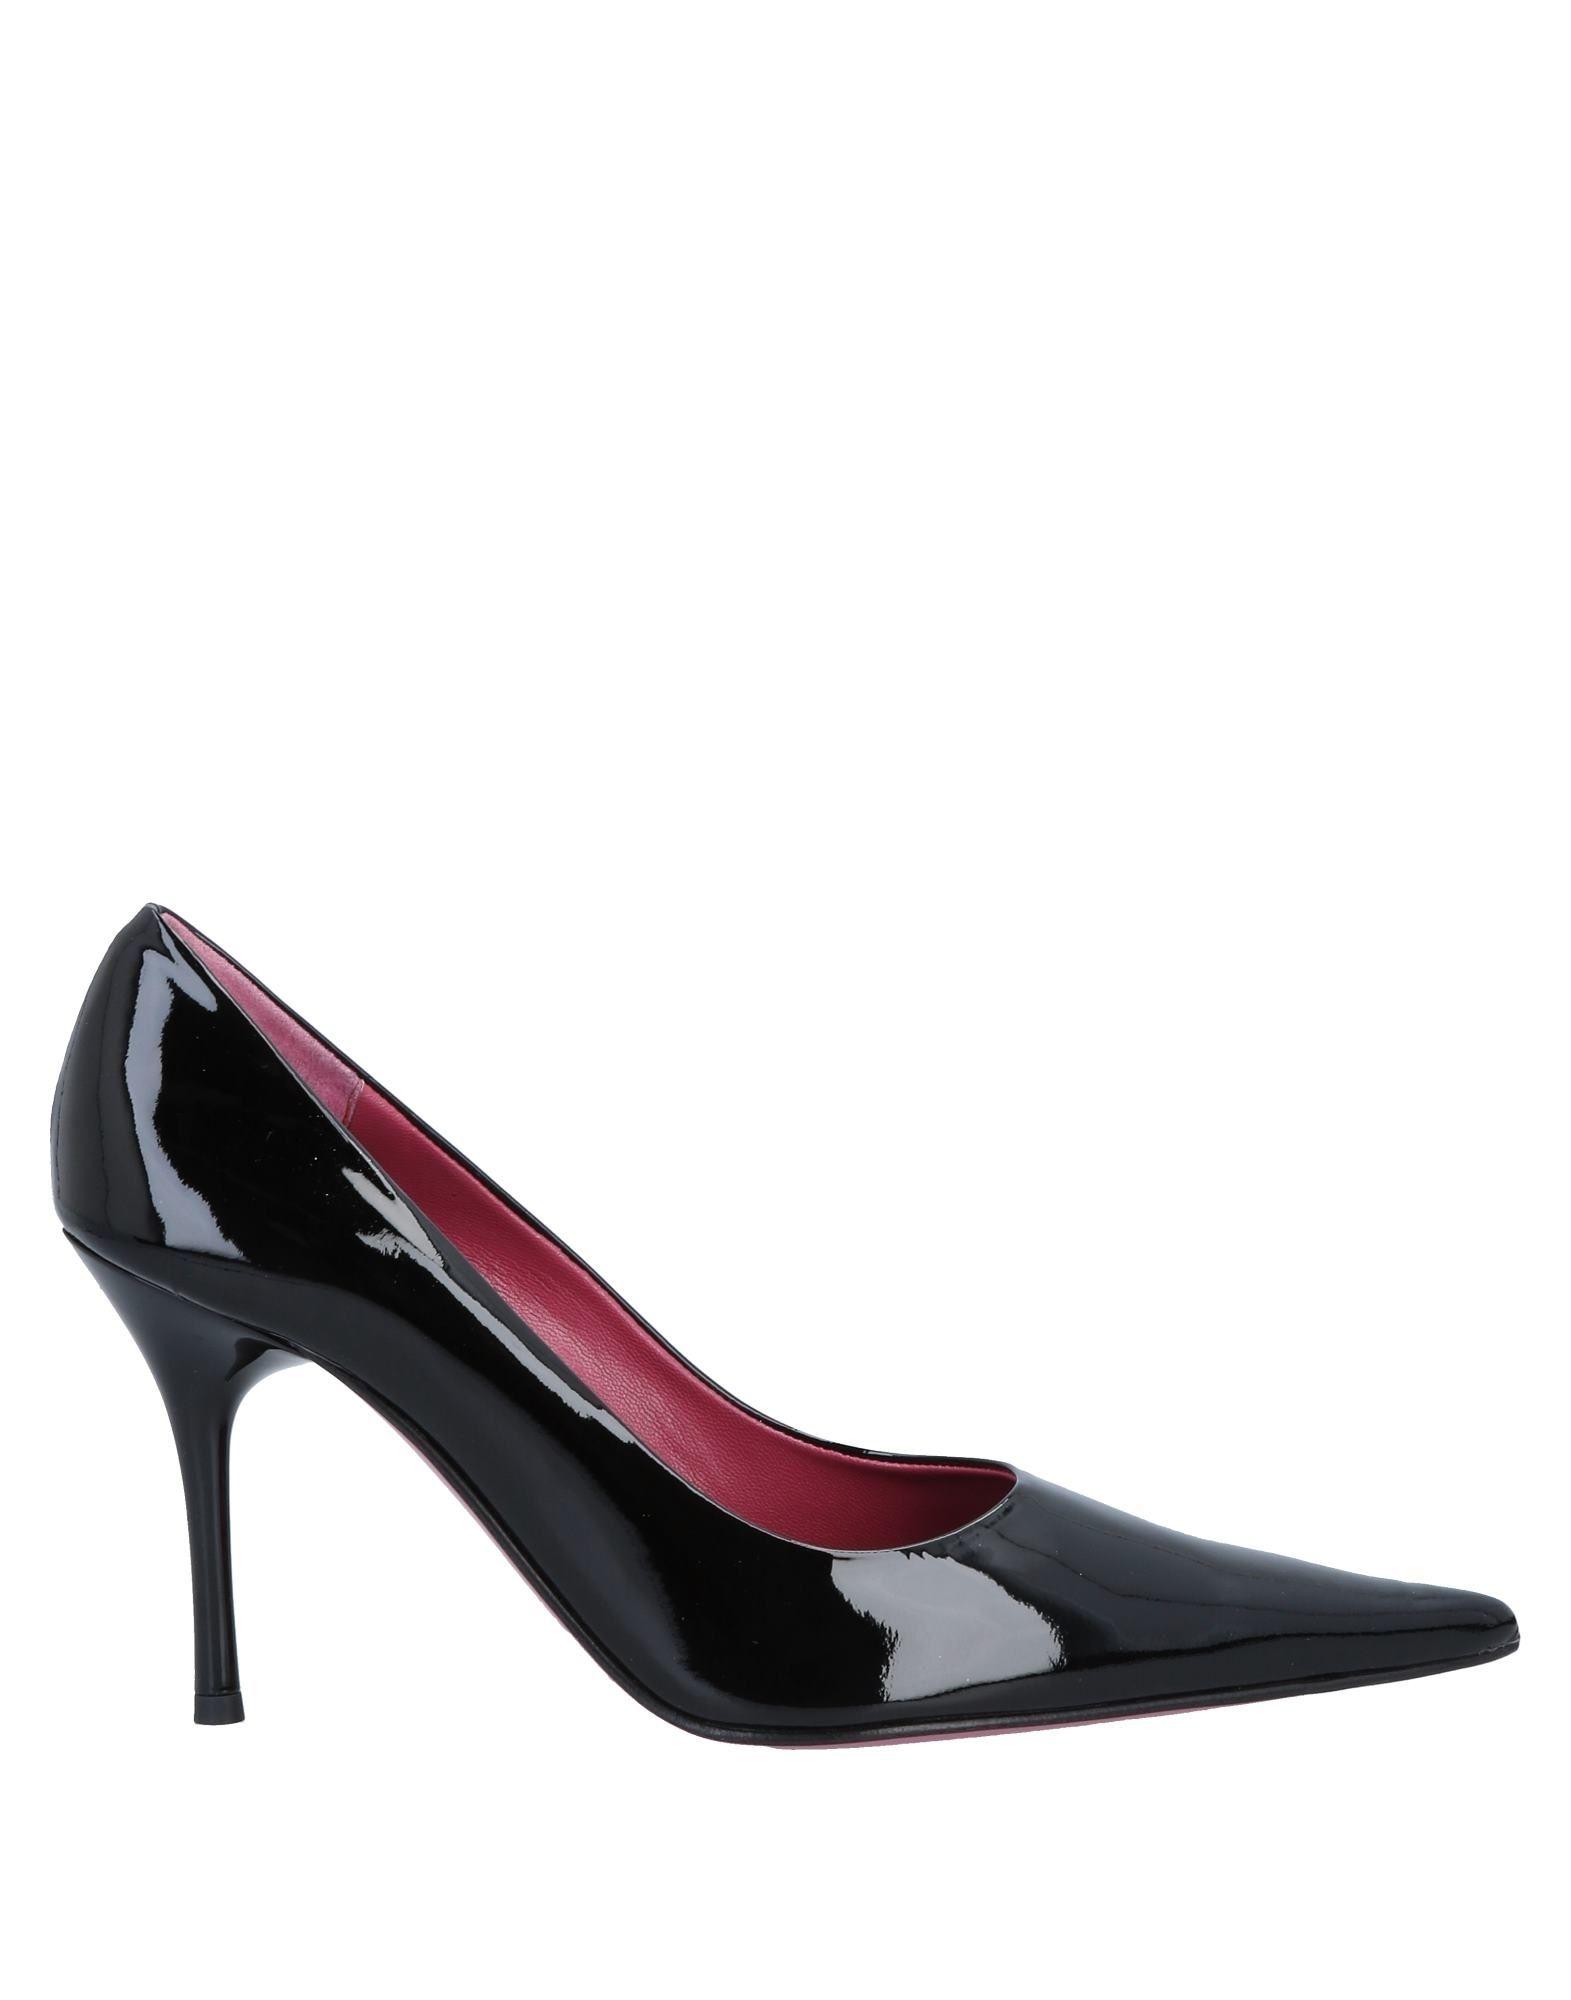 Stilvolle billige  Schuhe Versace Pumps Damen  billige 11566989WT 4f421e